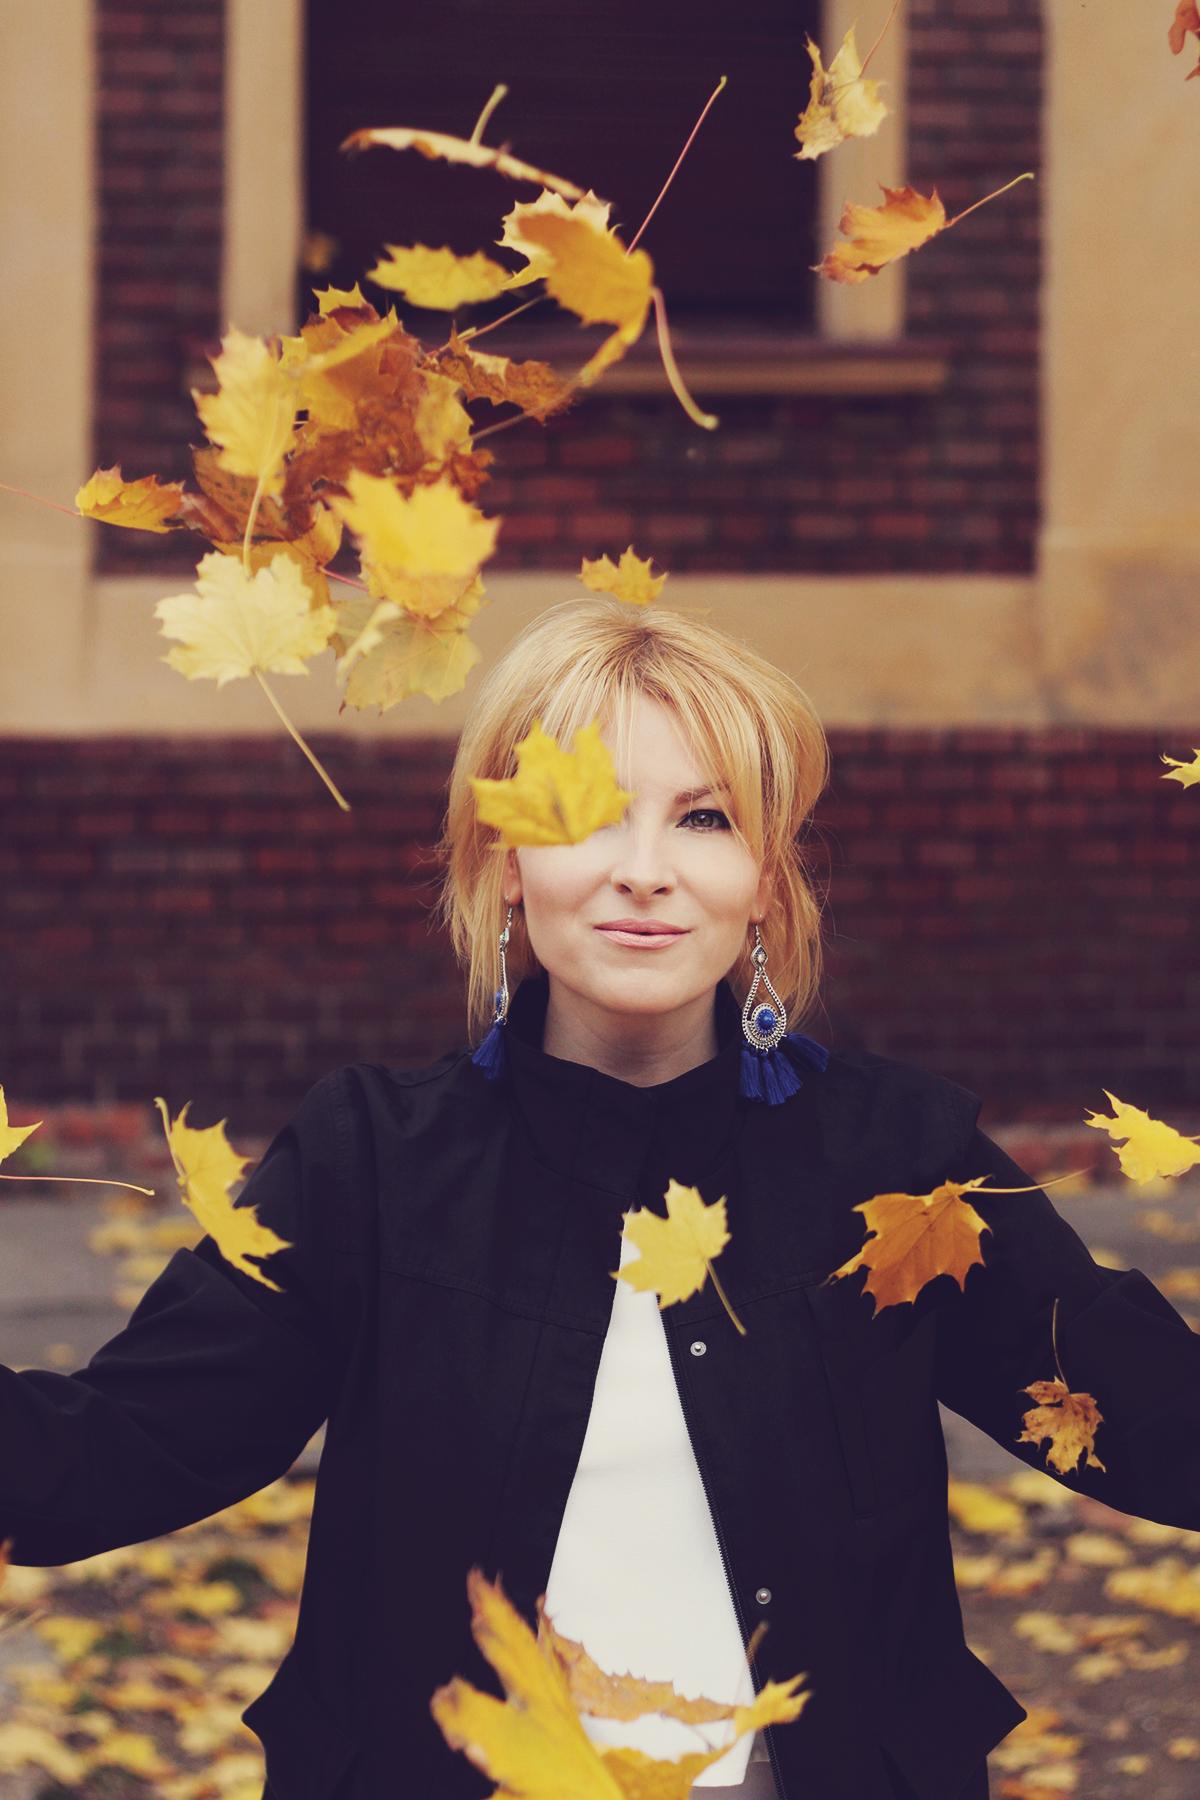 autumn, autumn leafs in the air, girl, portrait, tassel earrings, navy jacket, white top